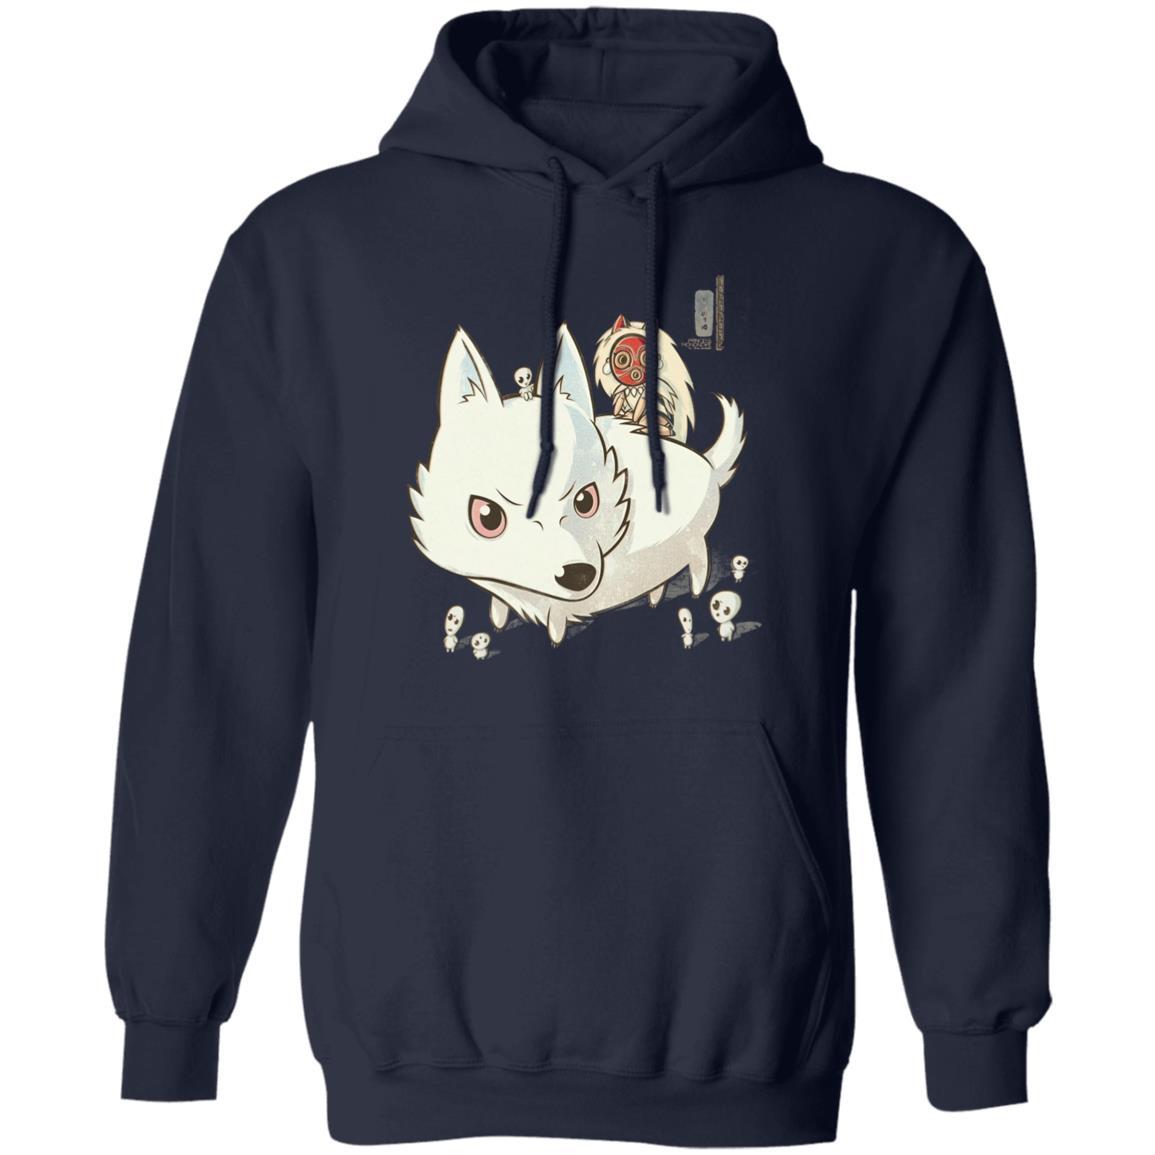 Princess Mononoke and The Wolf Cute Chibi Version Hoodie